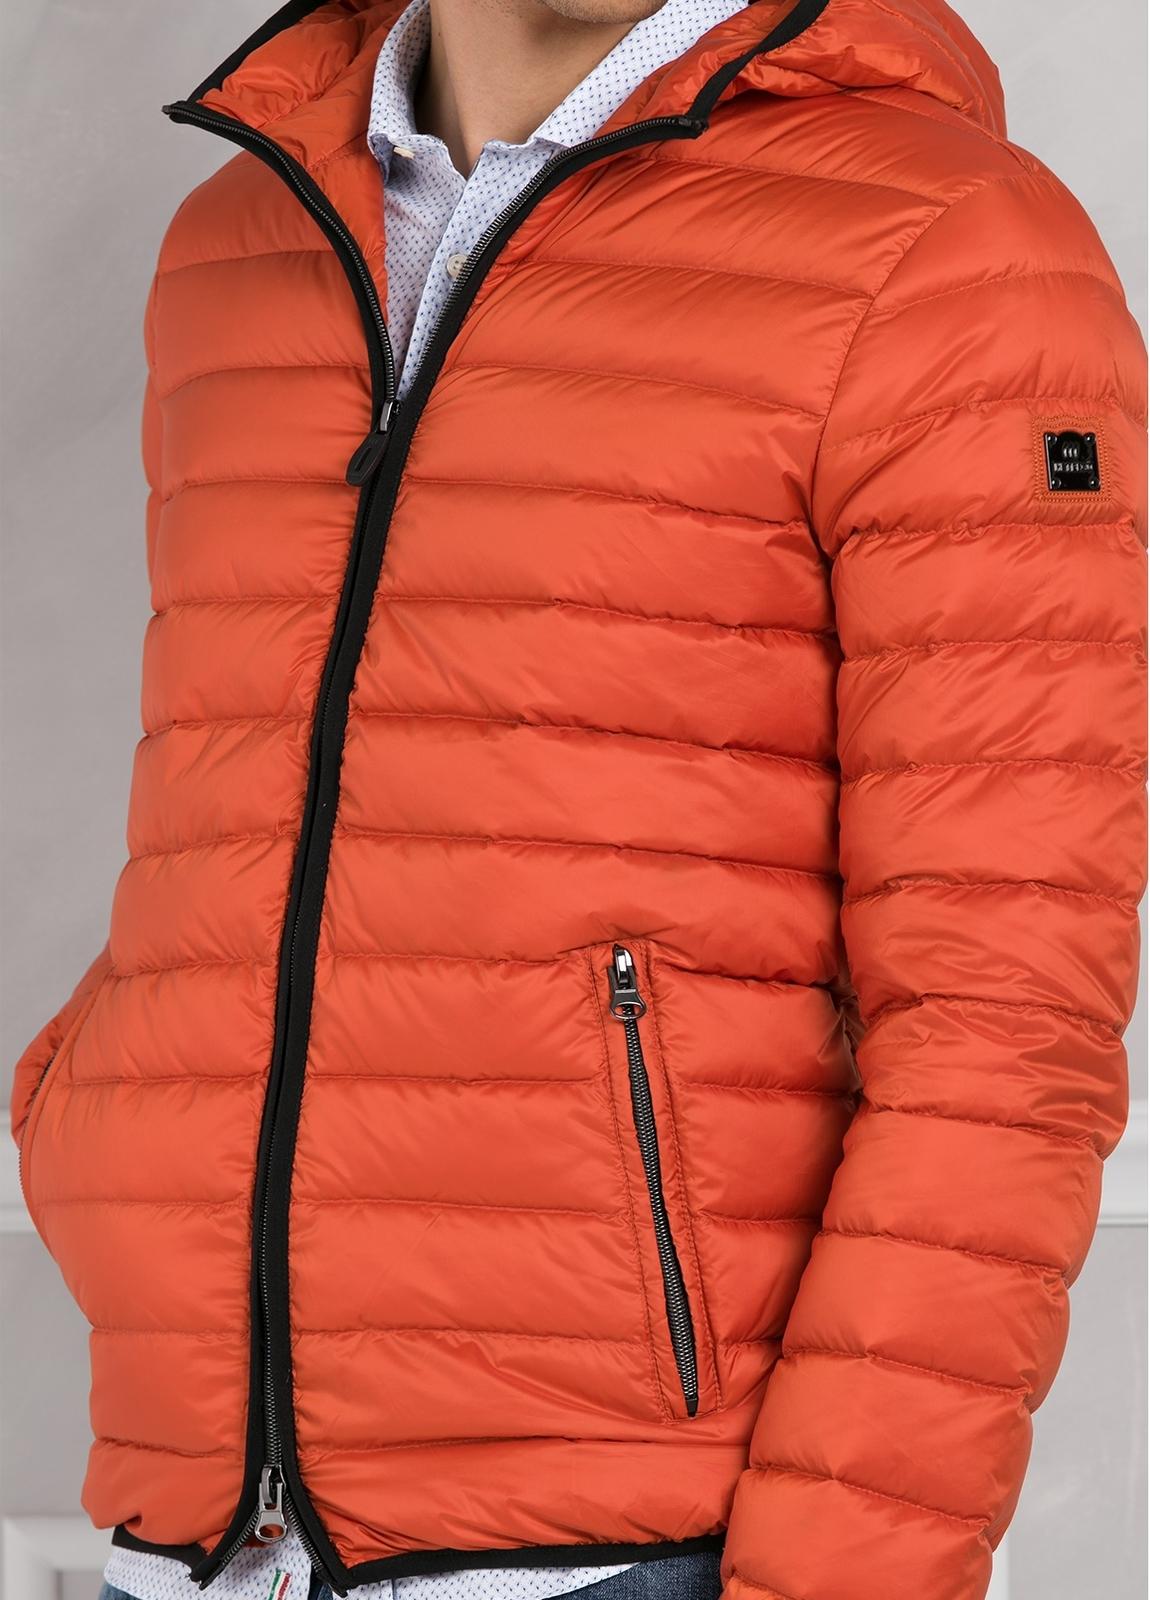 Chaqueta con capucha modelo ZEFIRO color naranja, tejido técnico. - Ítem2